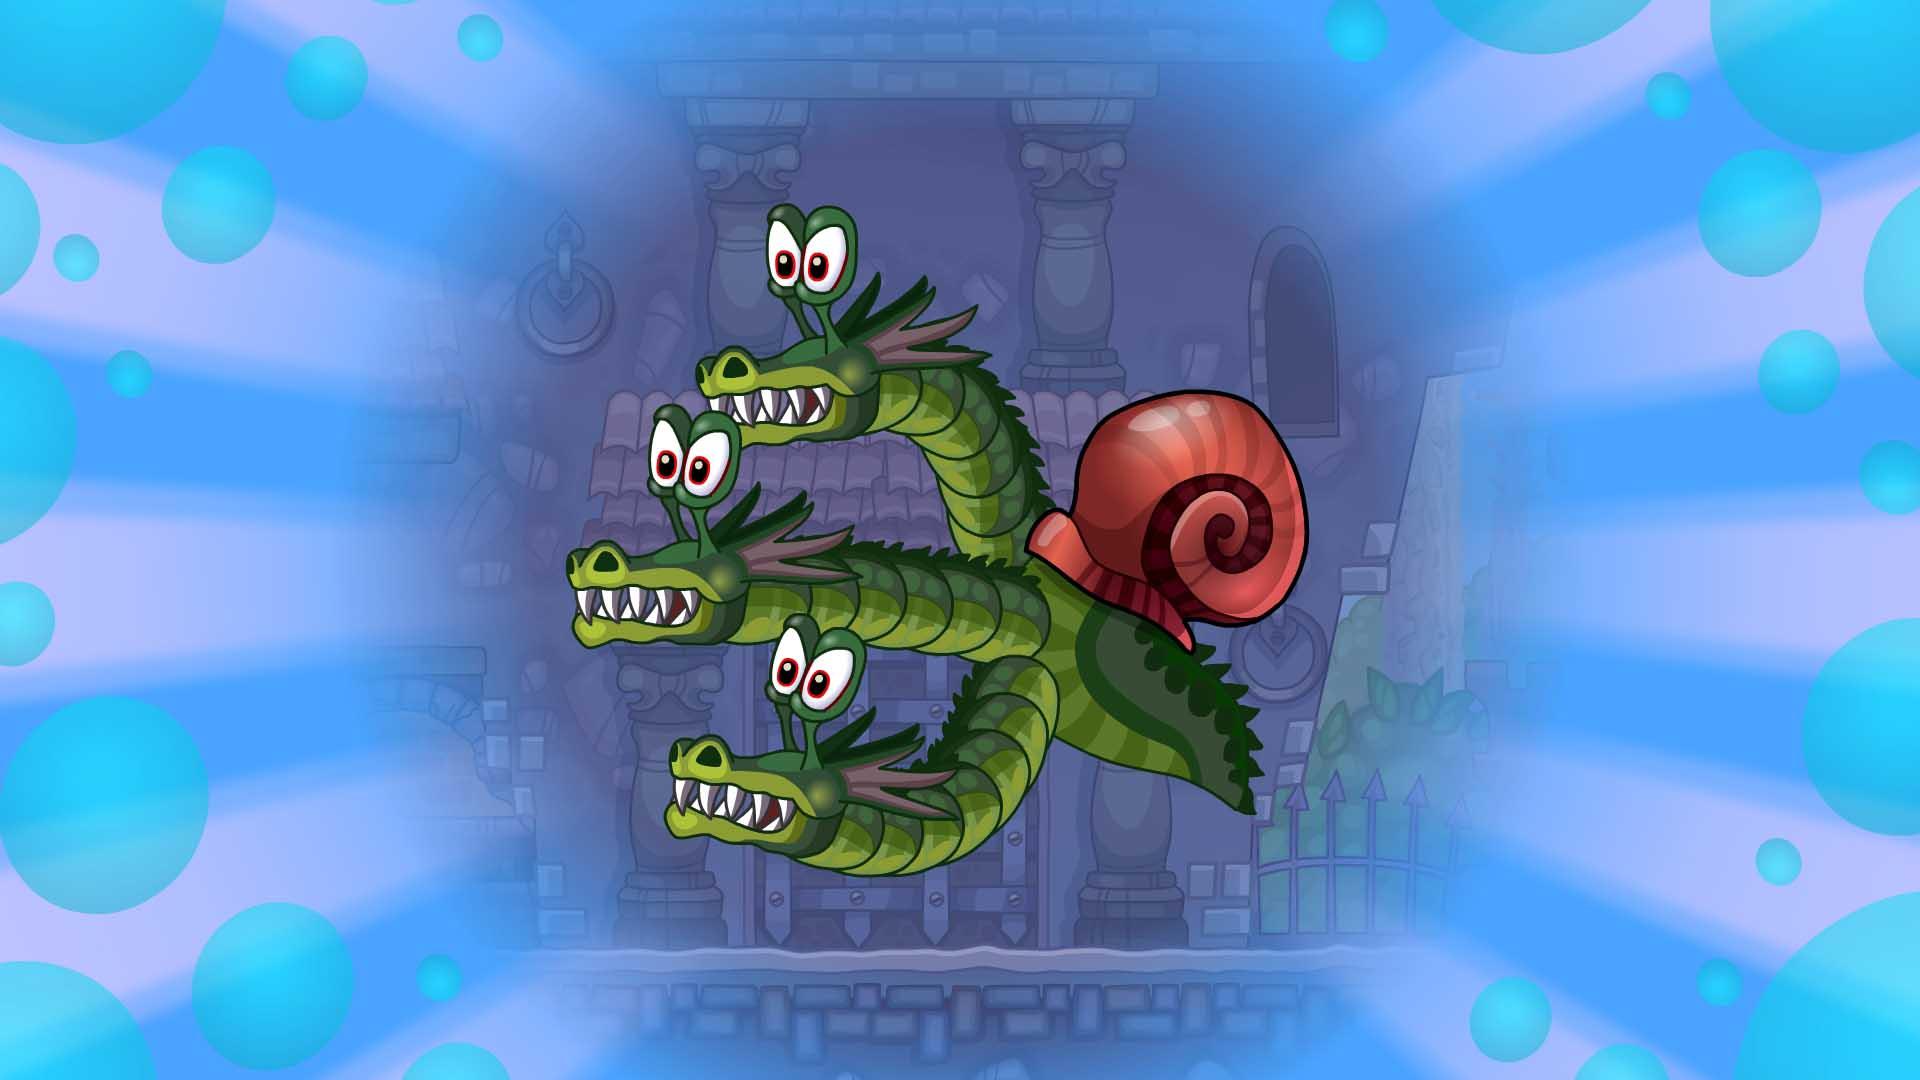 Steam Card Exchange Showcase Snail Bob 2